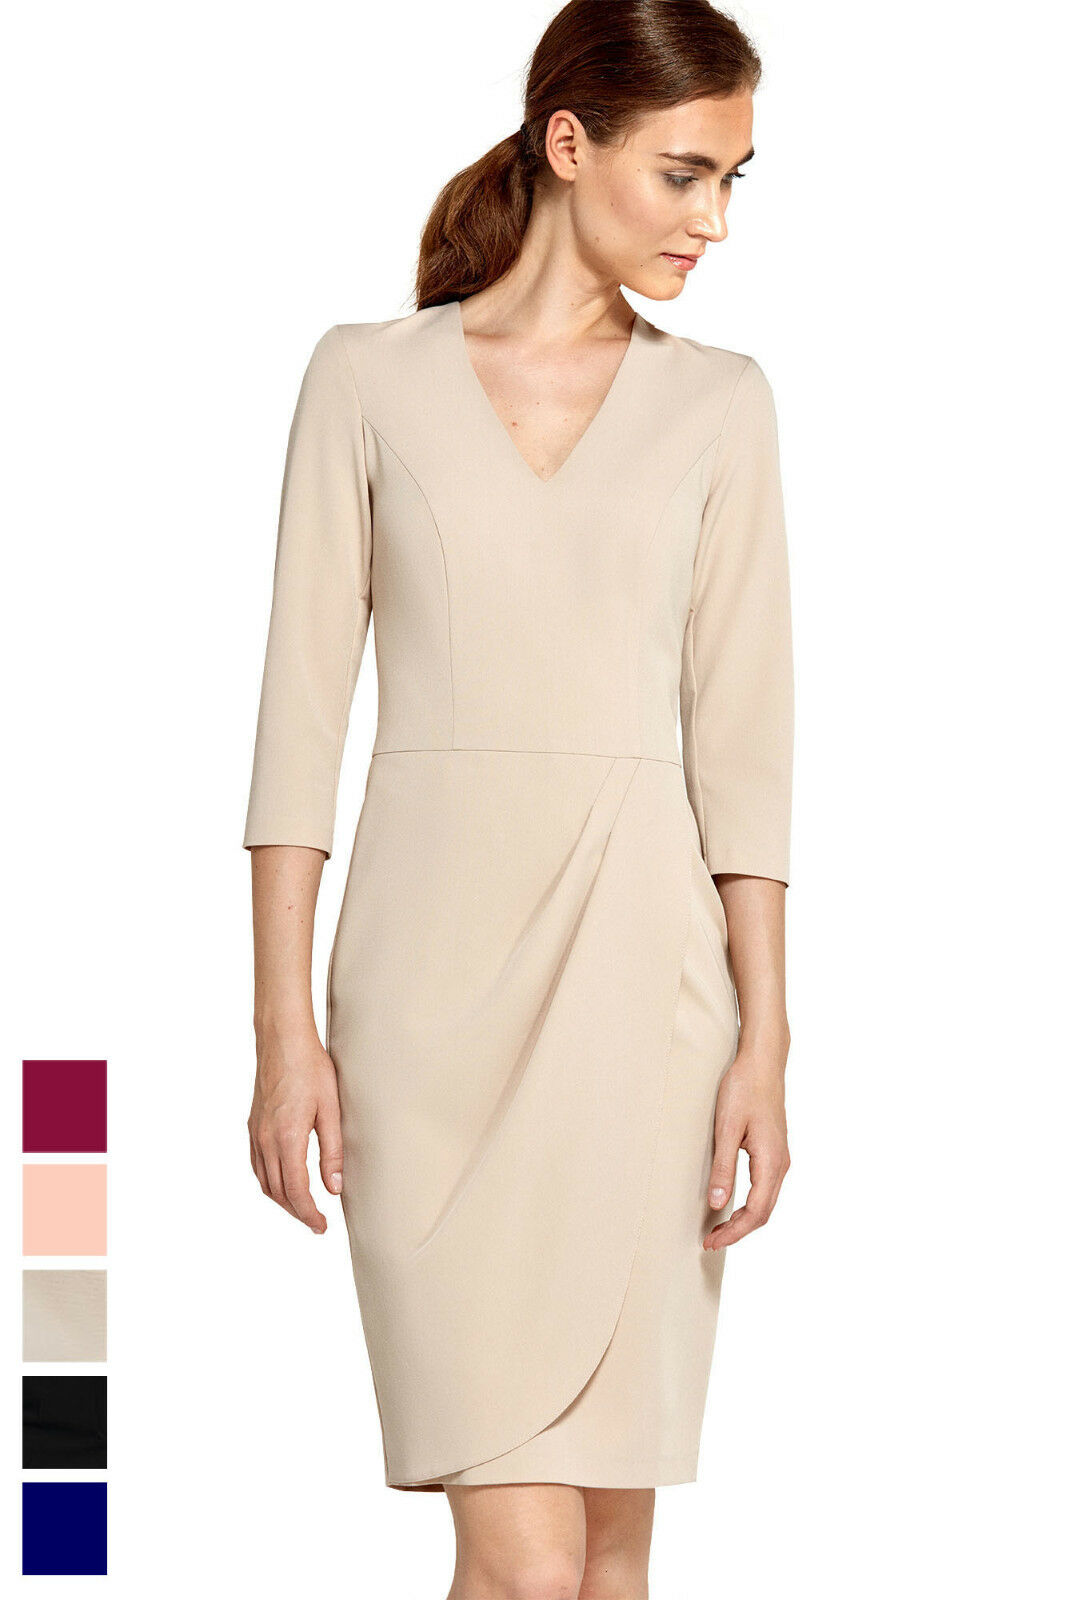 Damen Abend Kleid Etuikleid mit Drapierung 3 4 Arm Knielang V Ausschnitt Neu | Exzellente Verarbeitung  | Roman